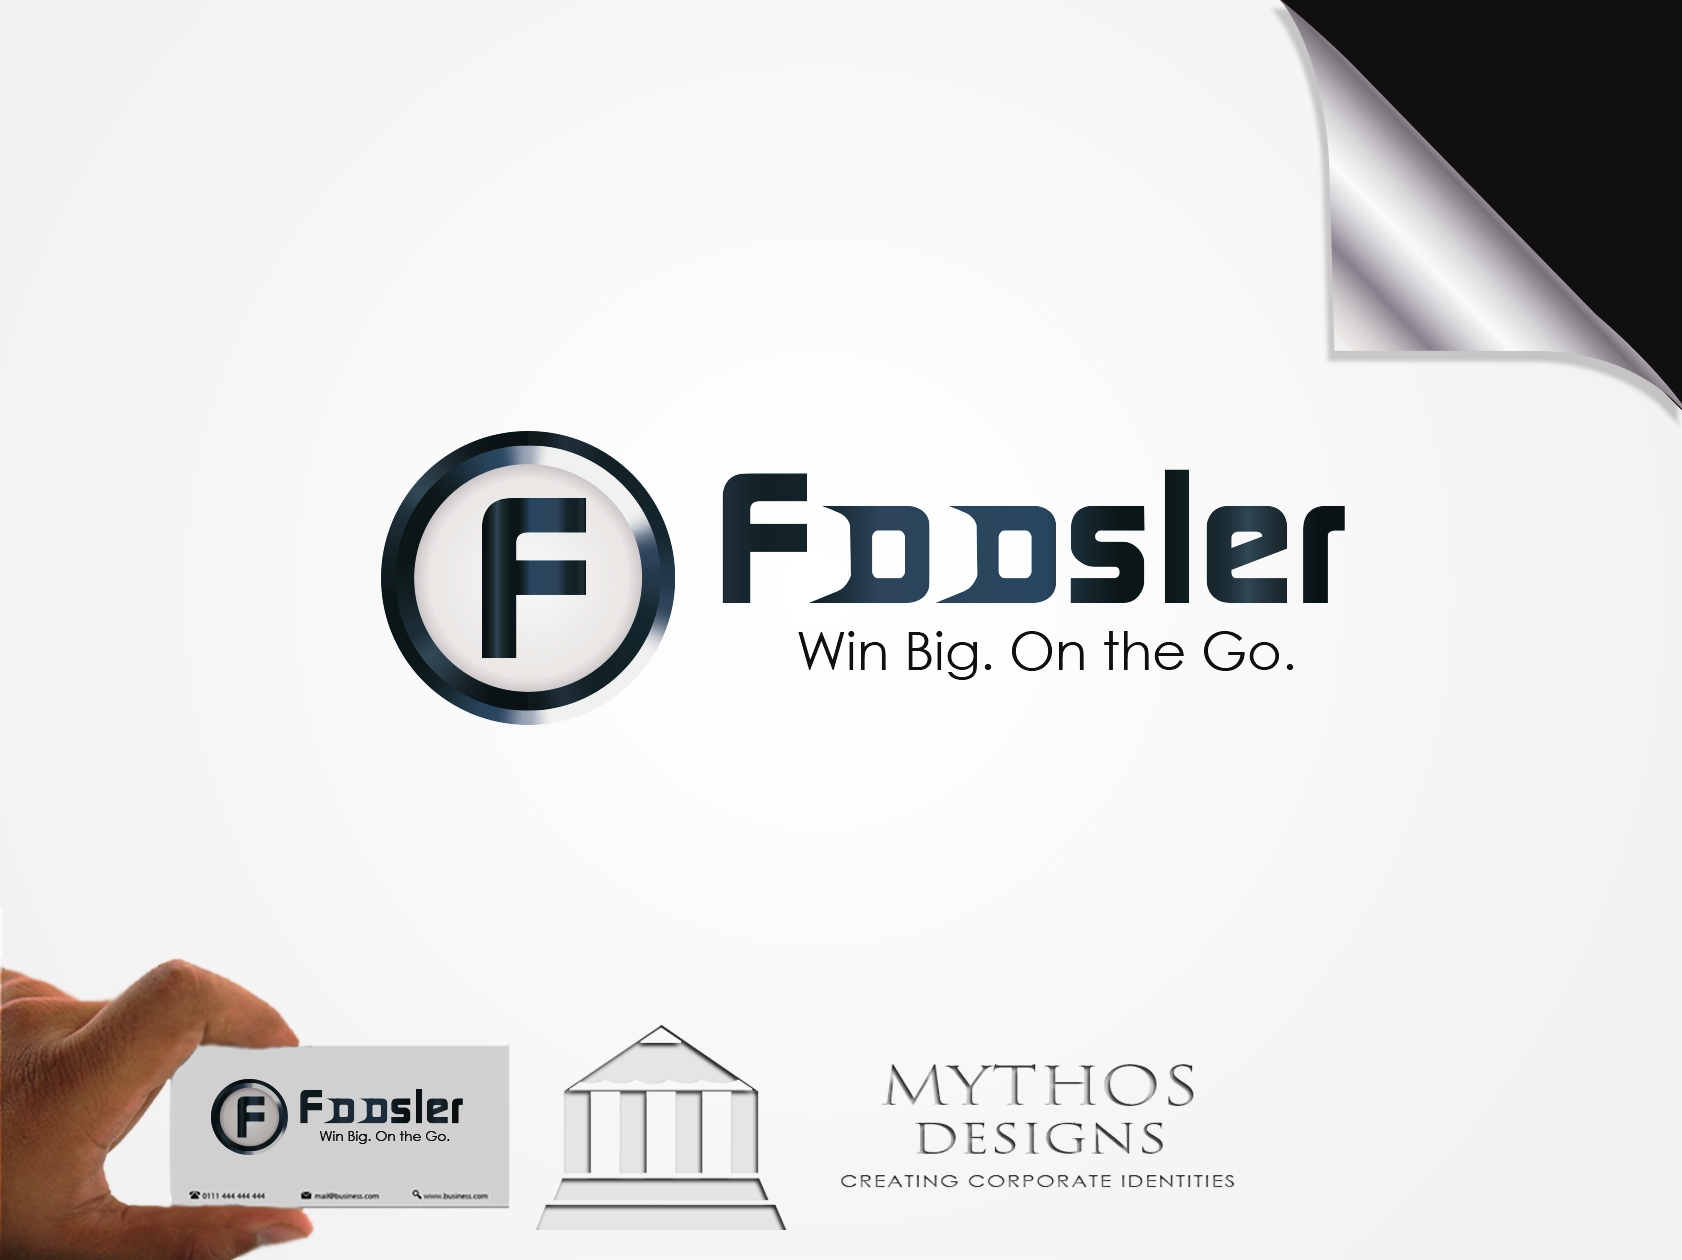 Logo Design by Mythos Designs - Entry No. 162 in the Logo Design Contest Foosler Logo Design.